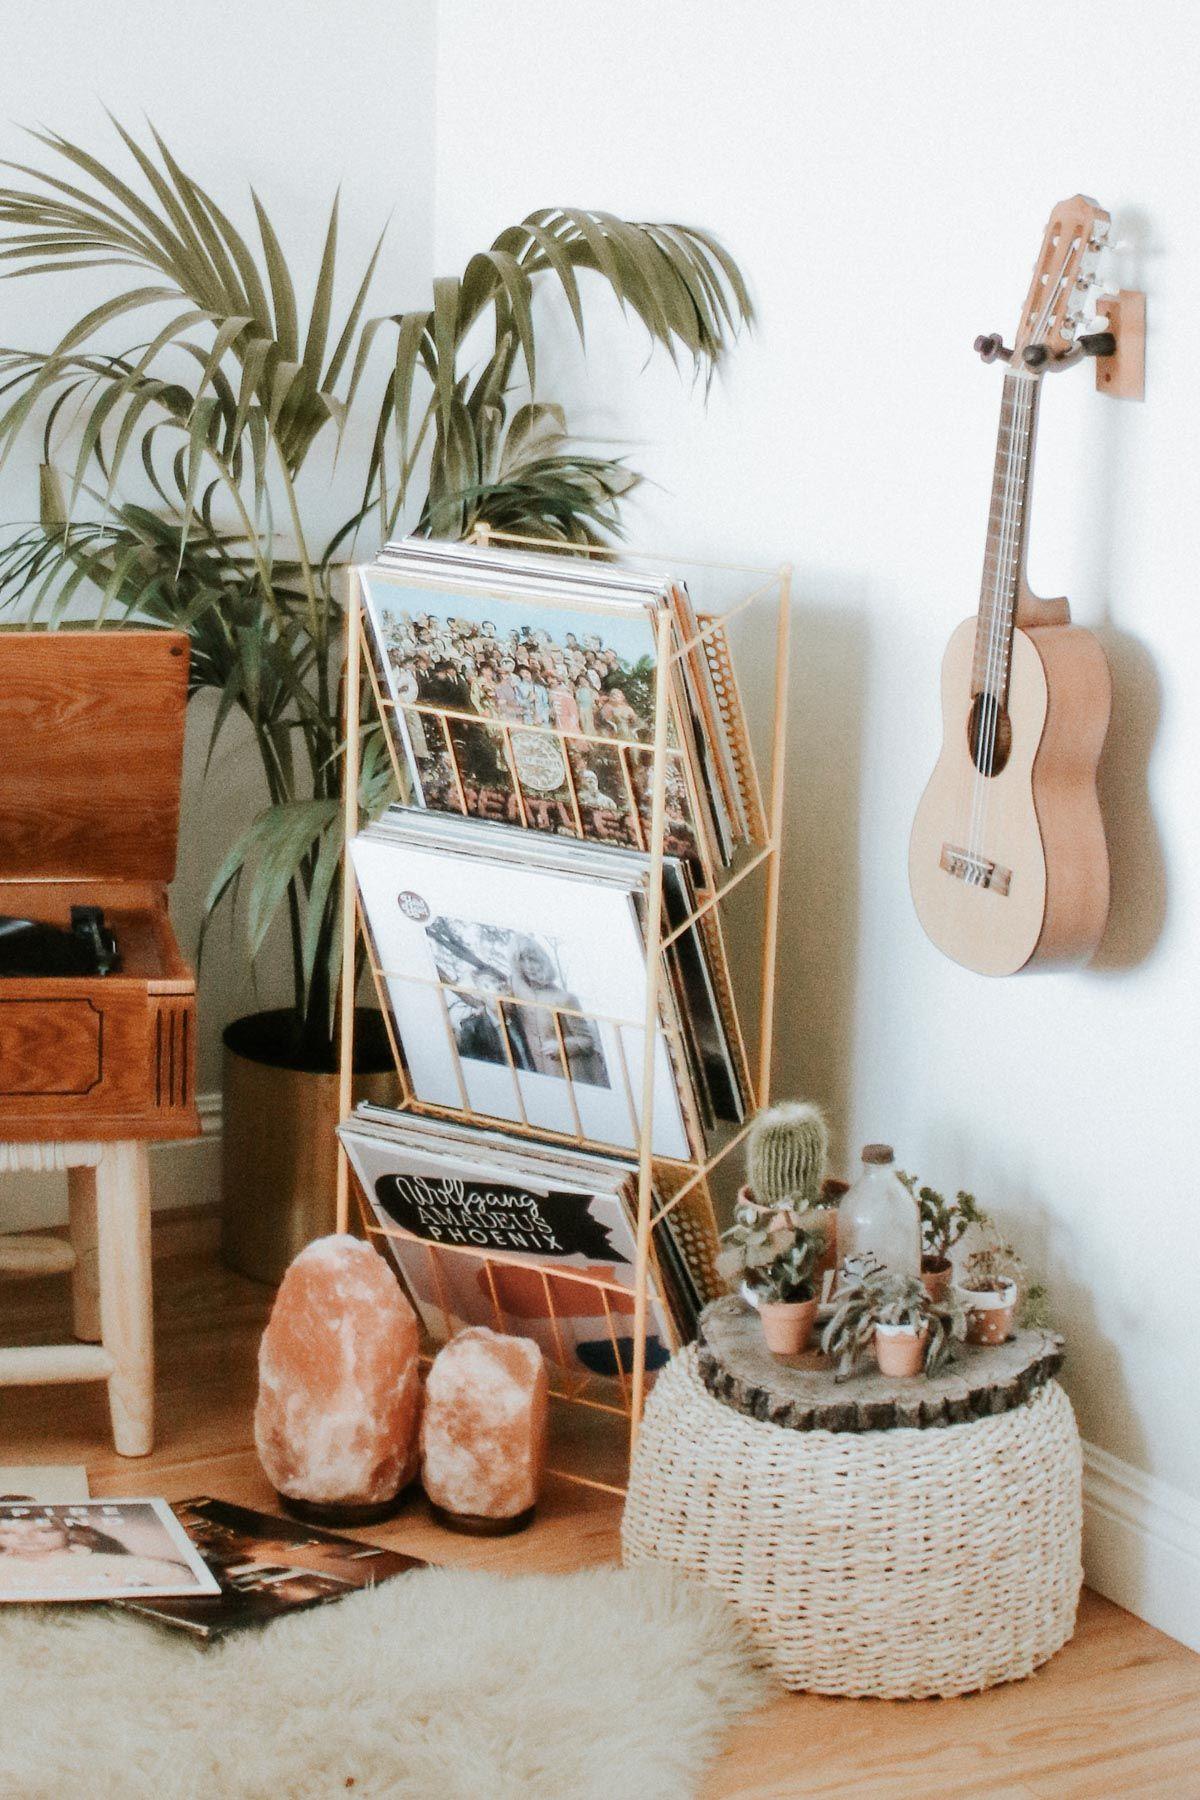 3 Ways to Style an Awkward Corner of Your Apartmen